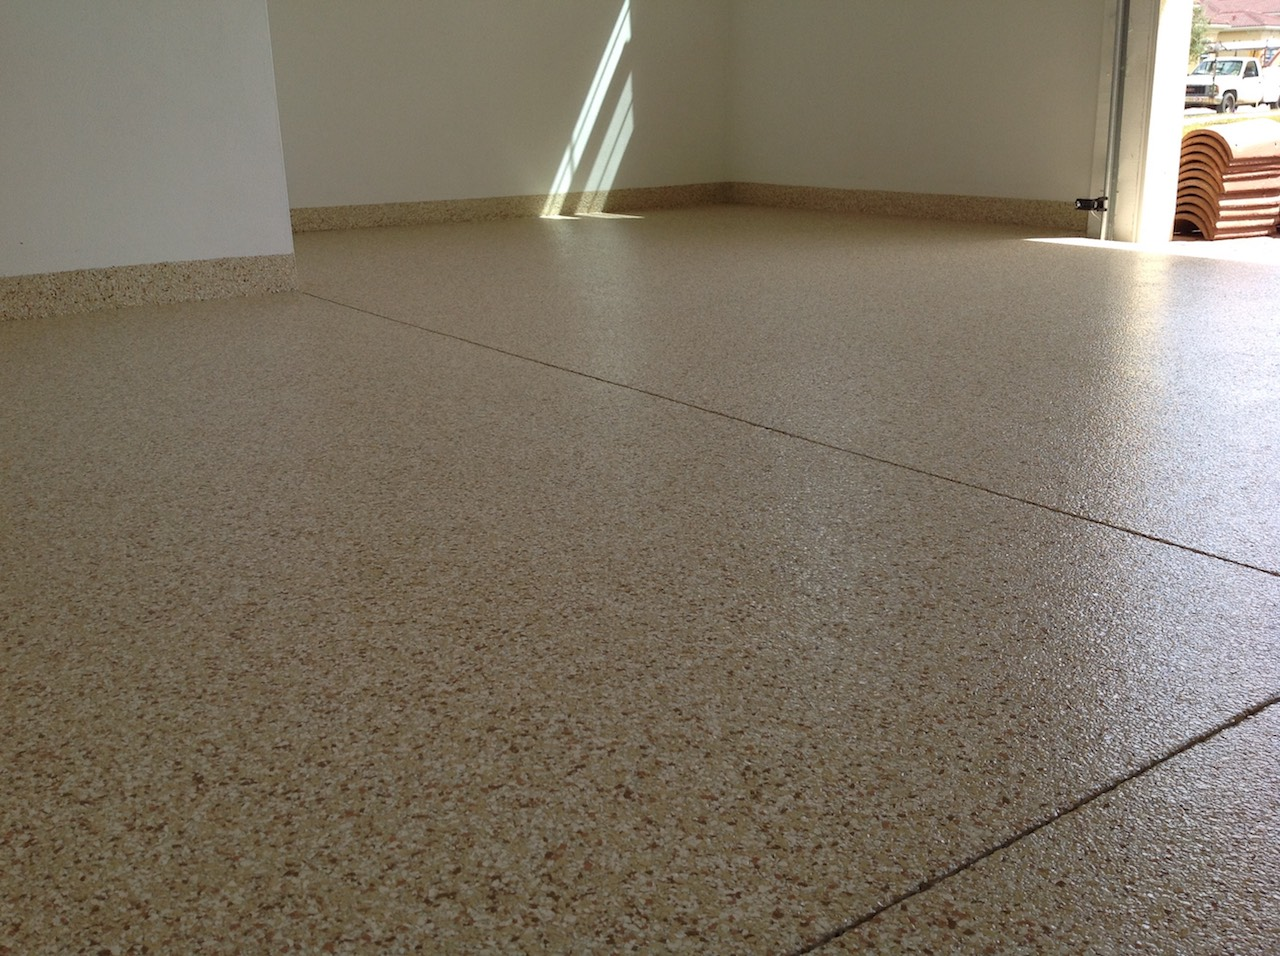 Carpet Installers Daytona Beach - Carpet Vidalondon